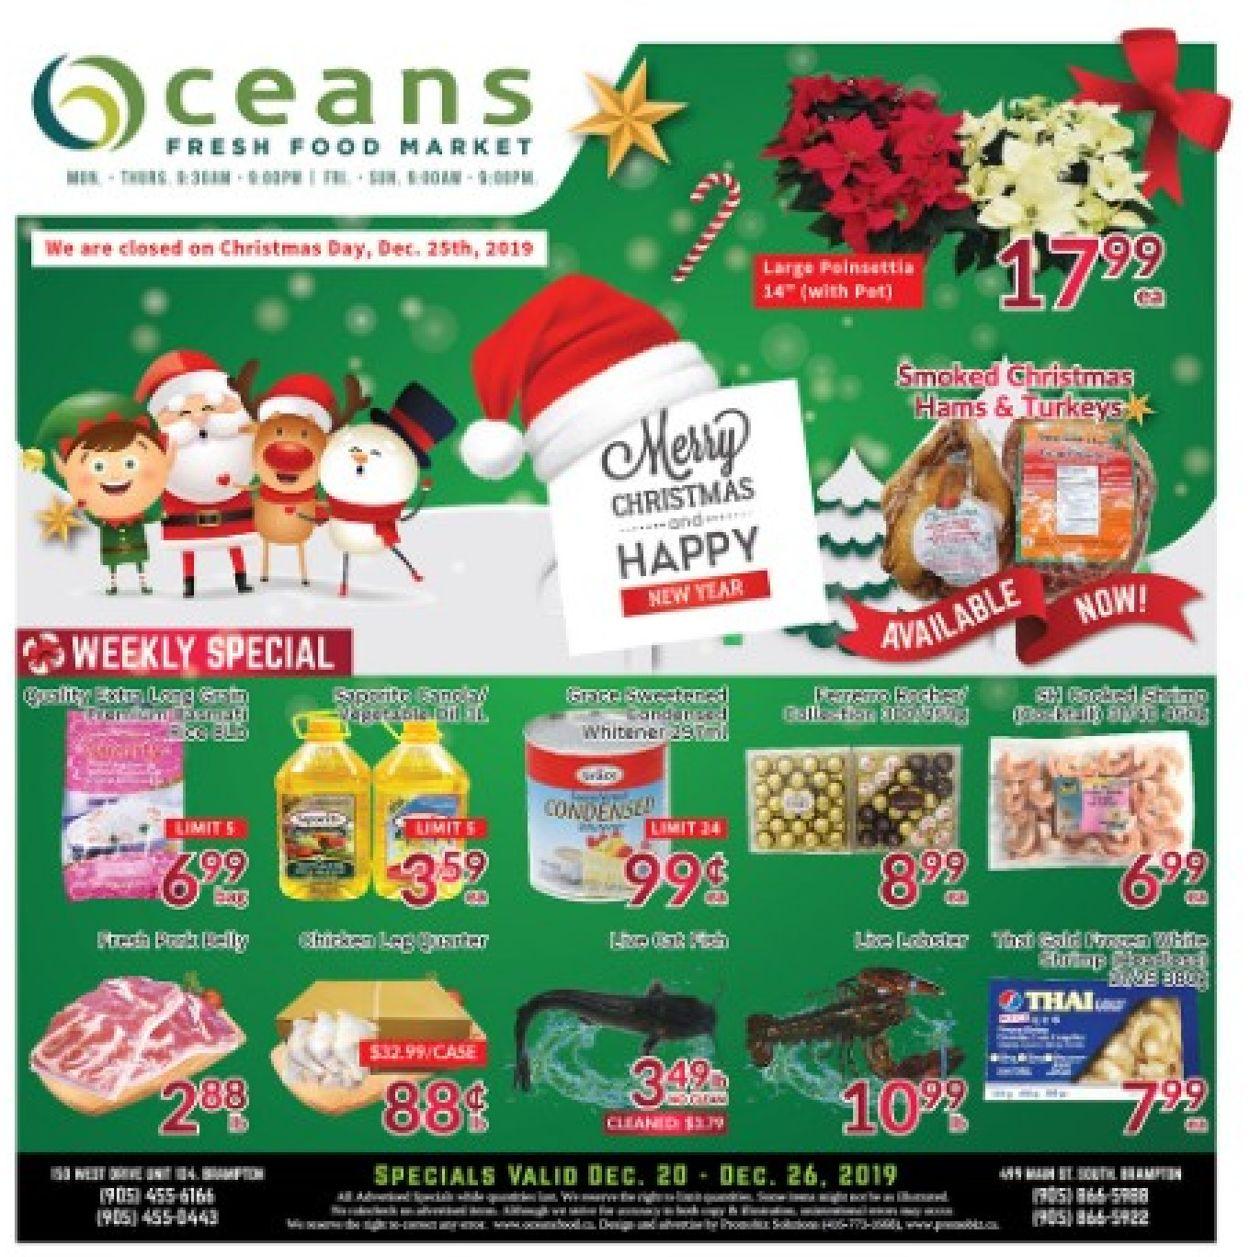 Oceans - Christmas 2019 Flyer